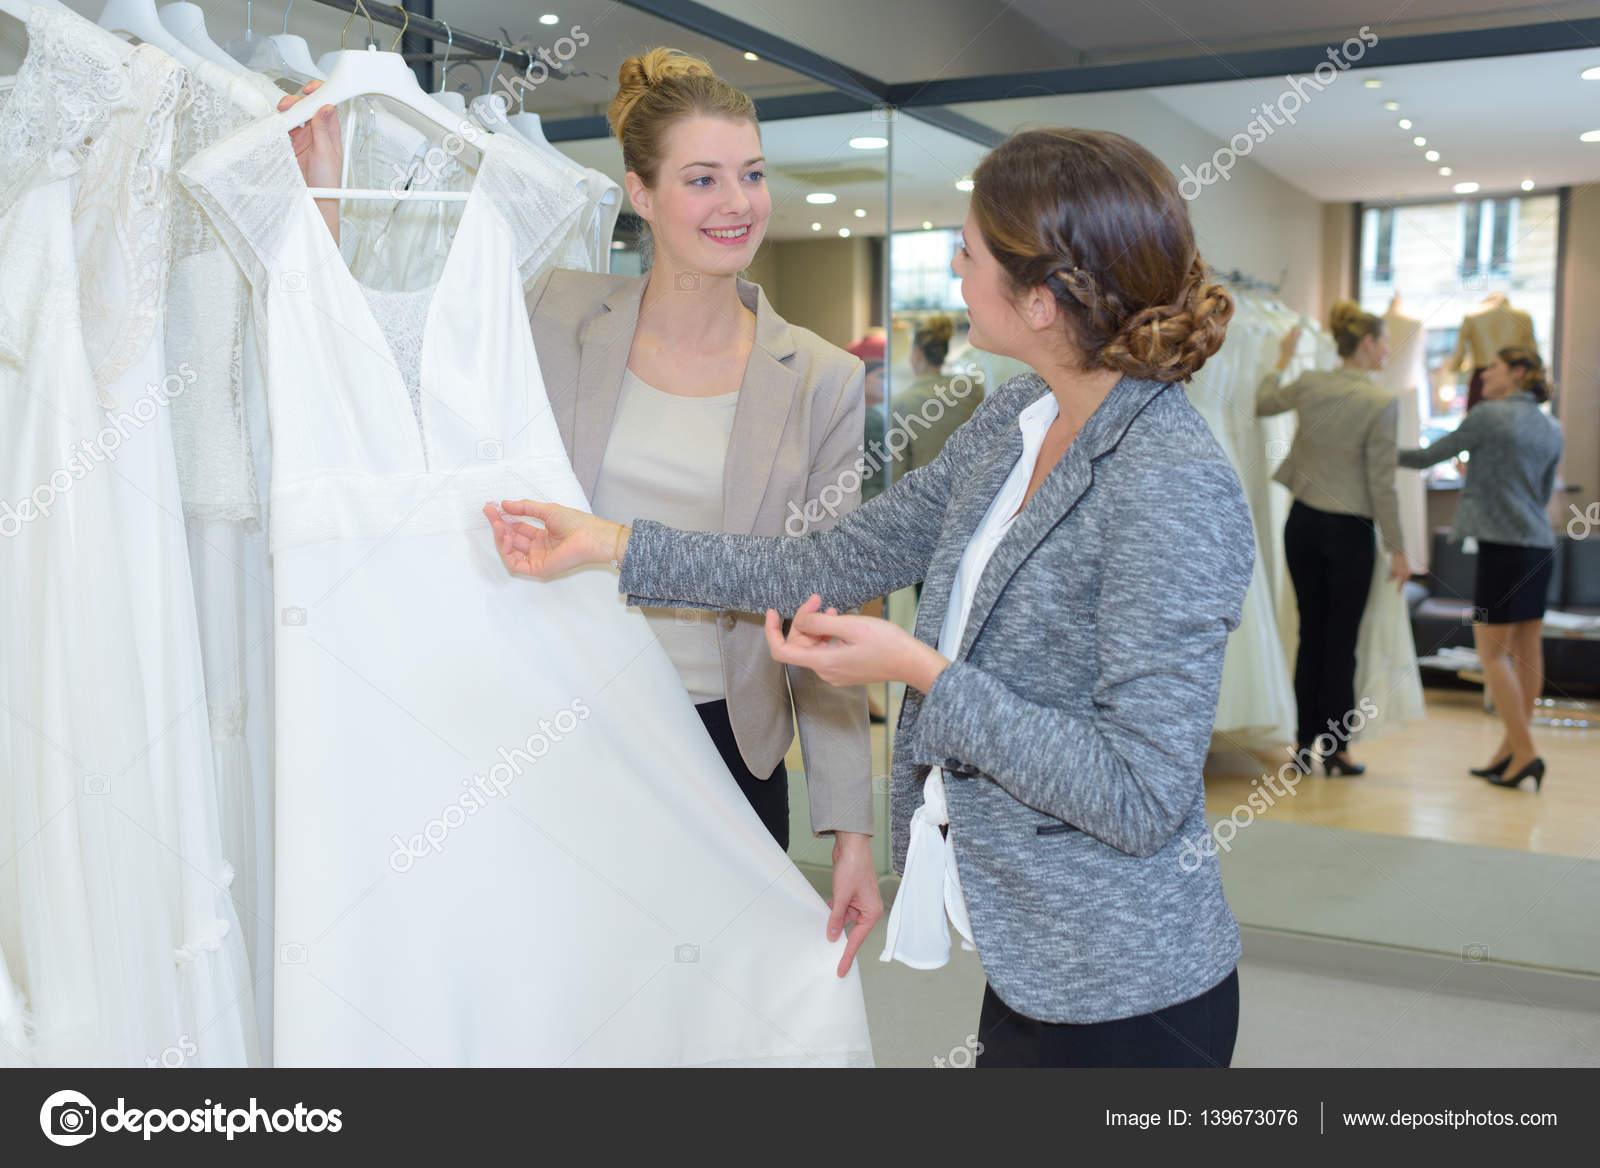 Frau betrachten Brautkleider — Stockfoto © photography33 #139673076